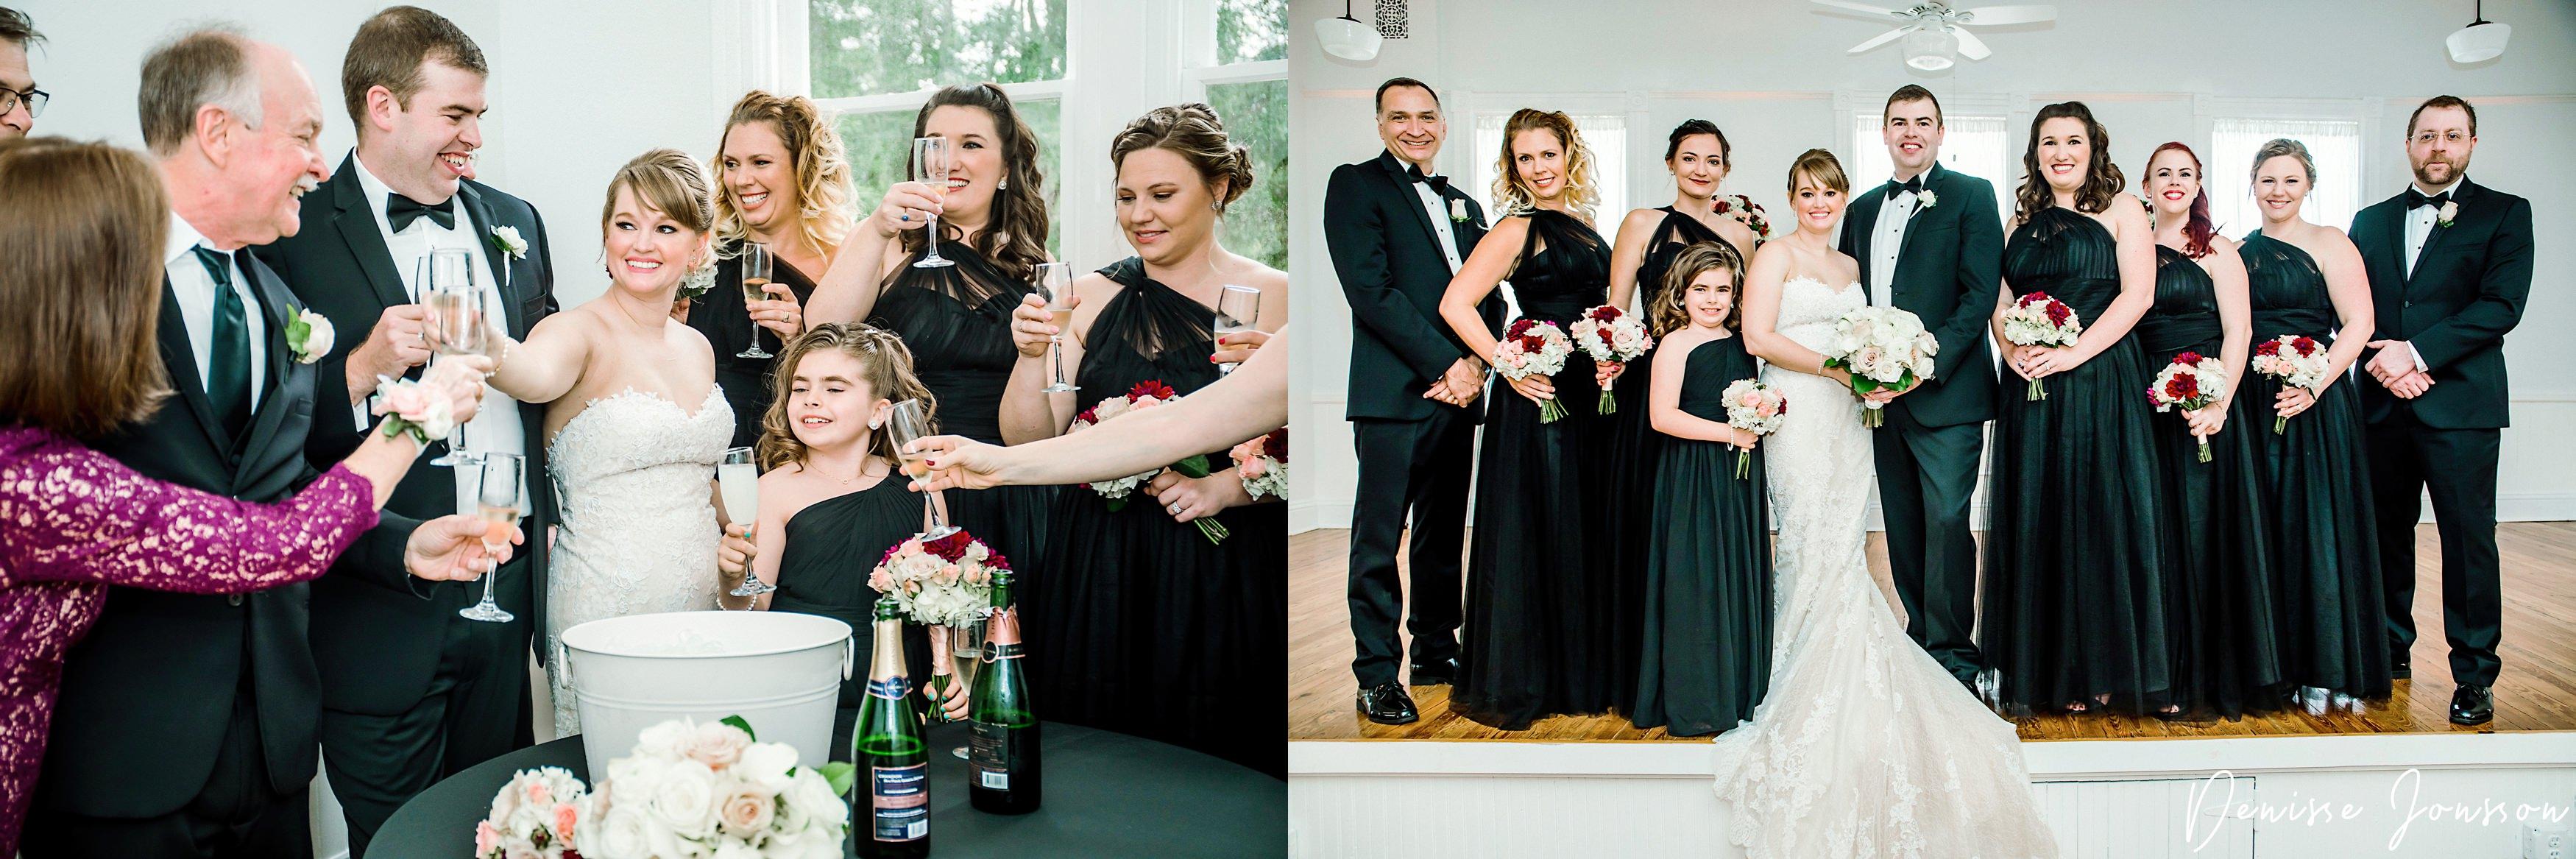 Orlando classic wedding photography